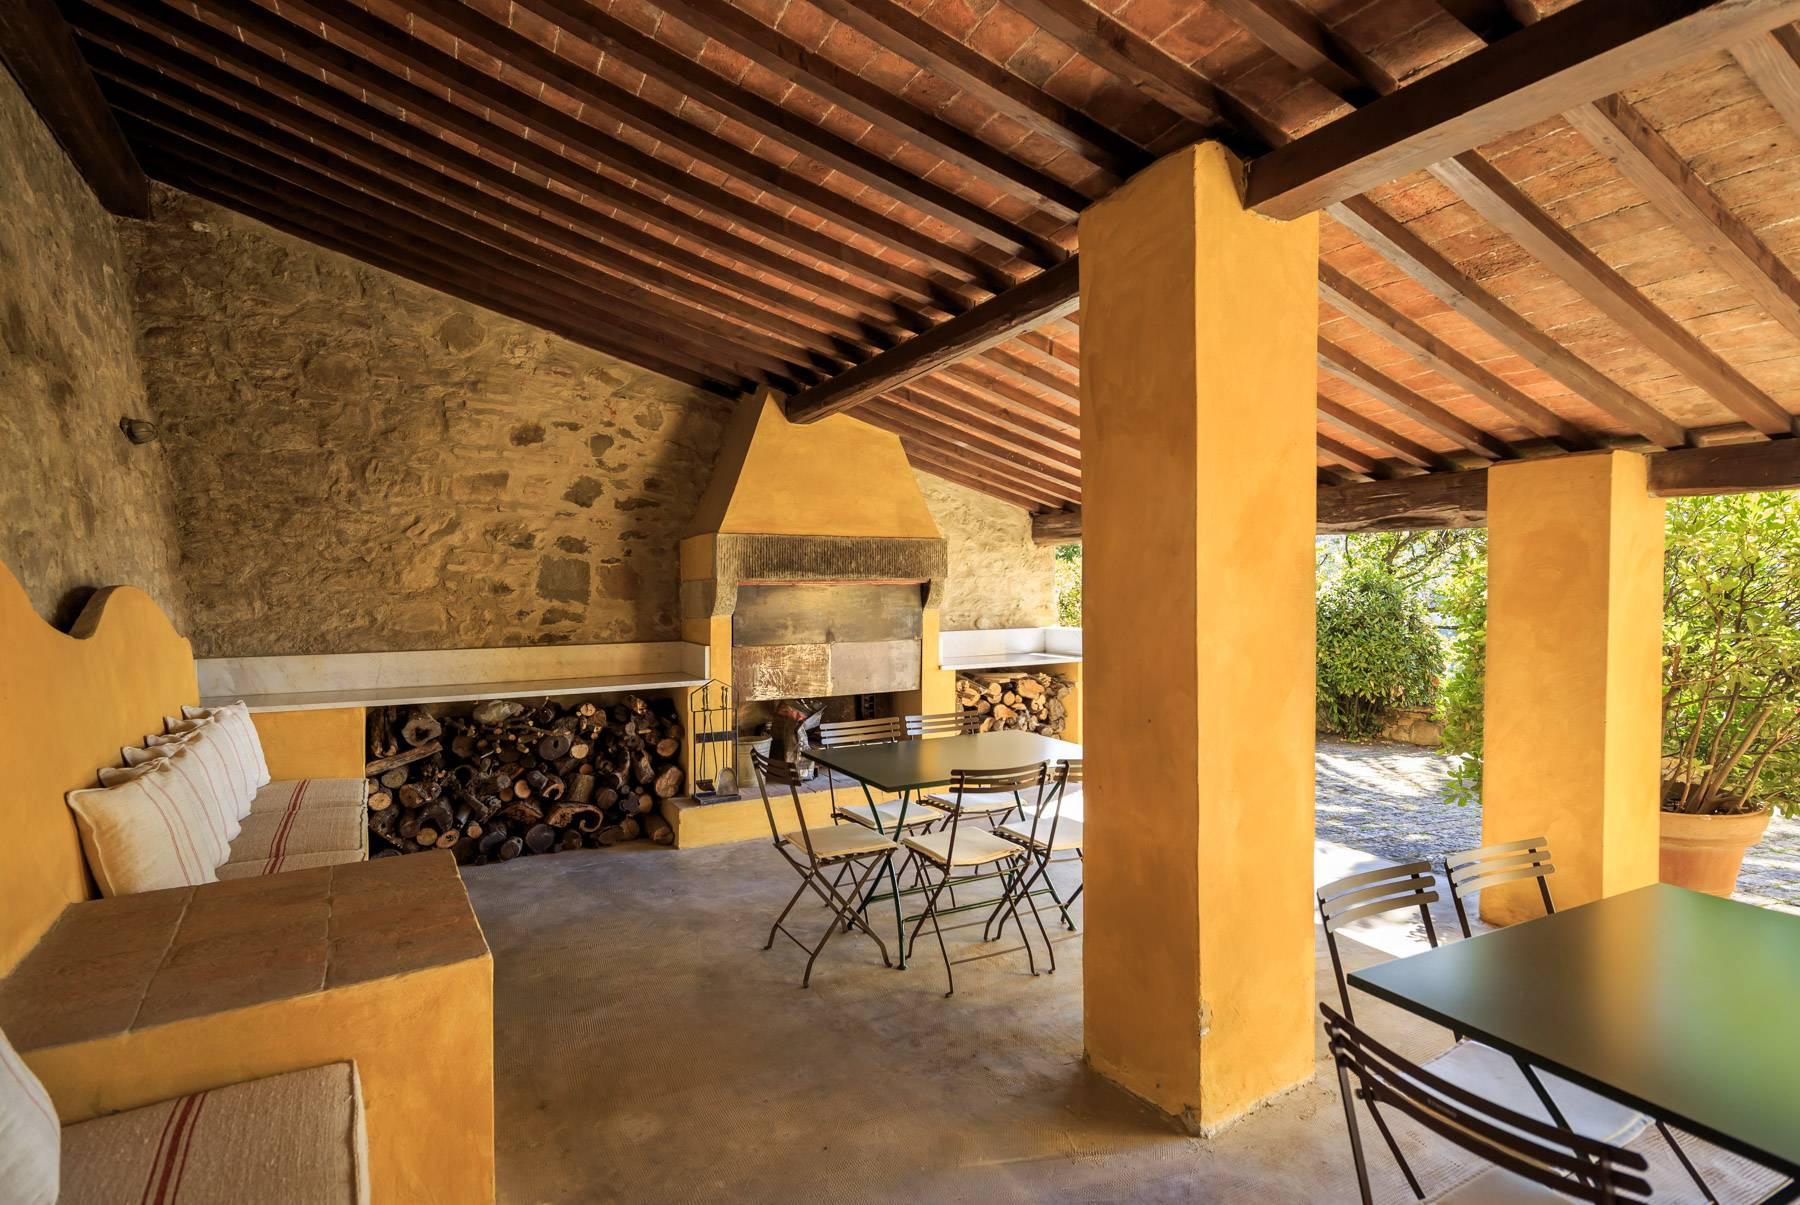 Villa in Affitto a Firenze: 5 locali, 600 mq - Foto 15